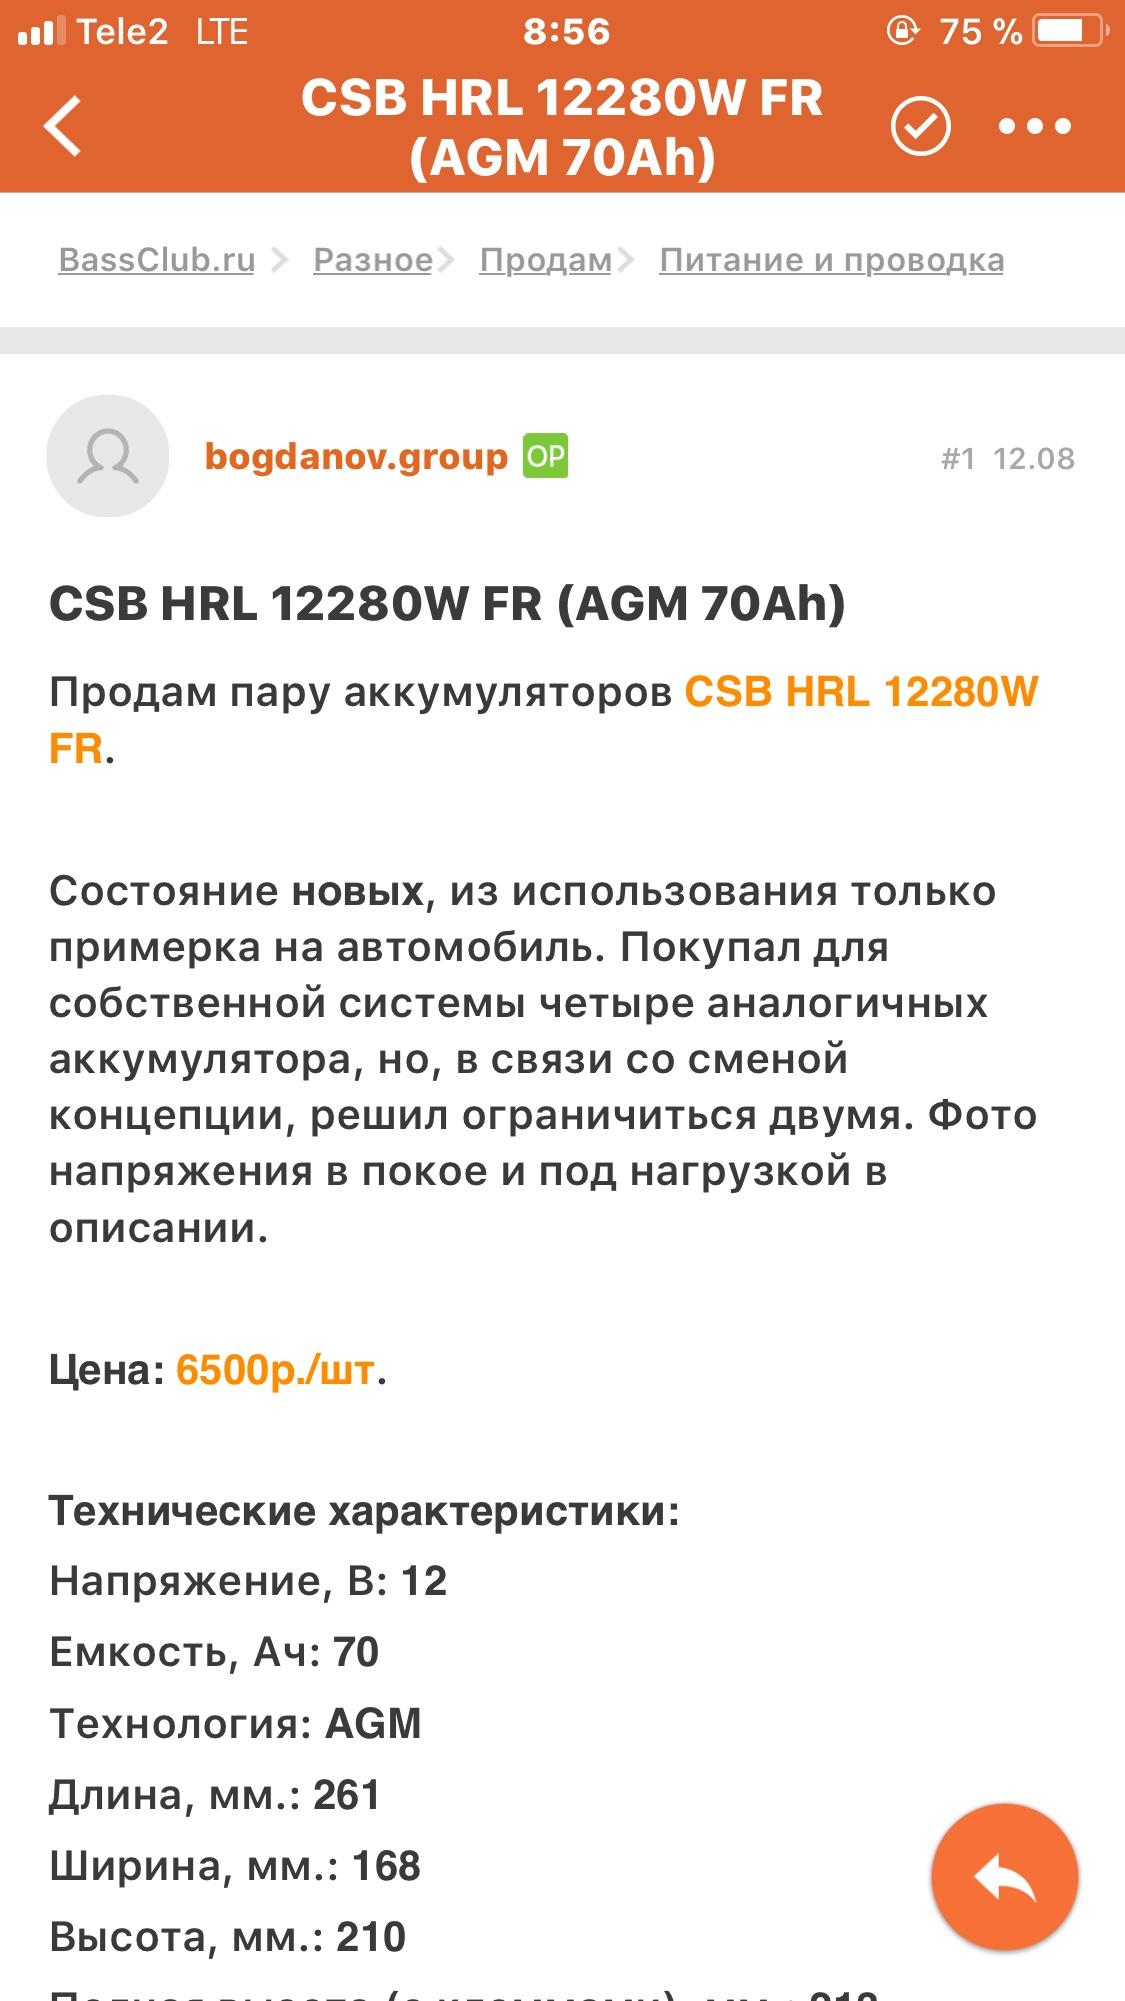 8161ecfdecf7bd1457bb65580db9f211.jpg